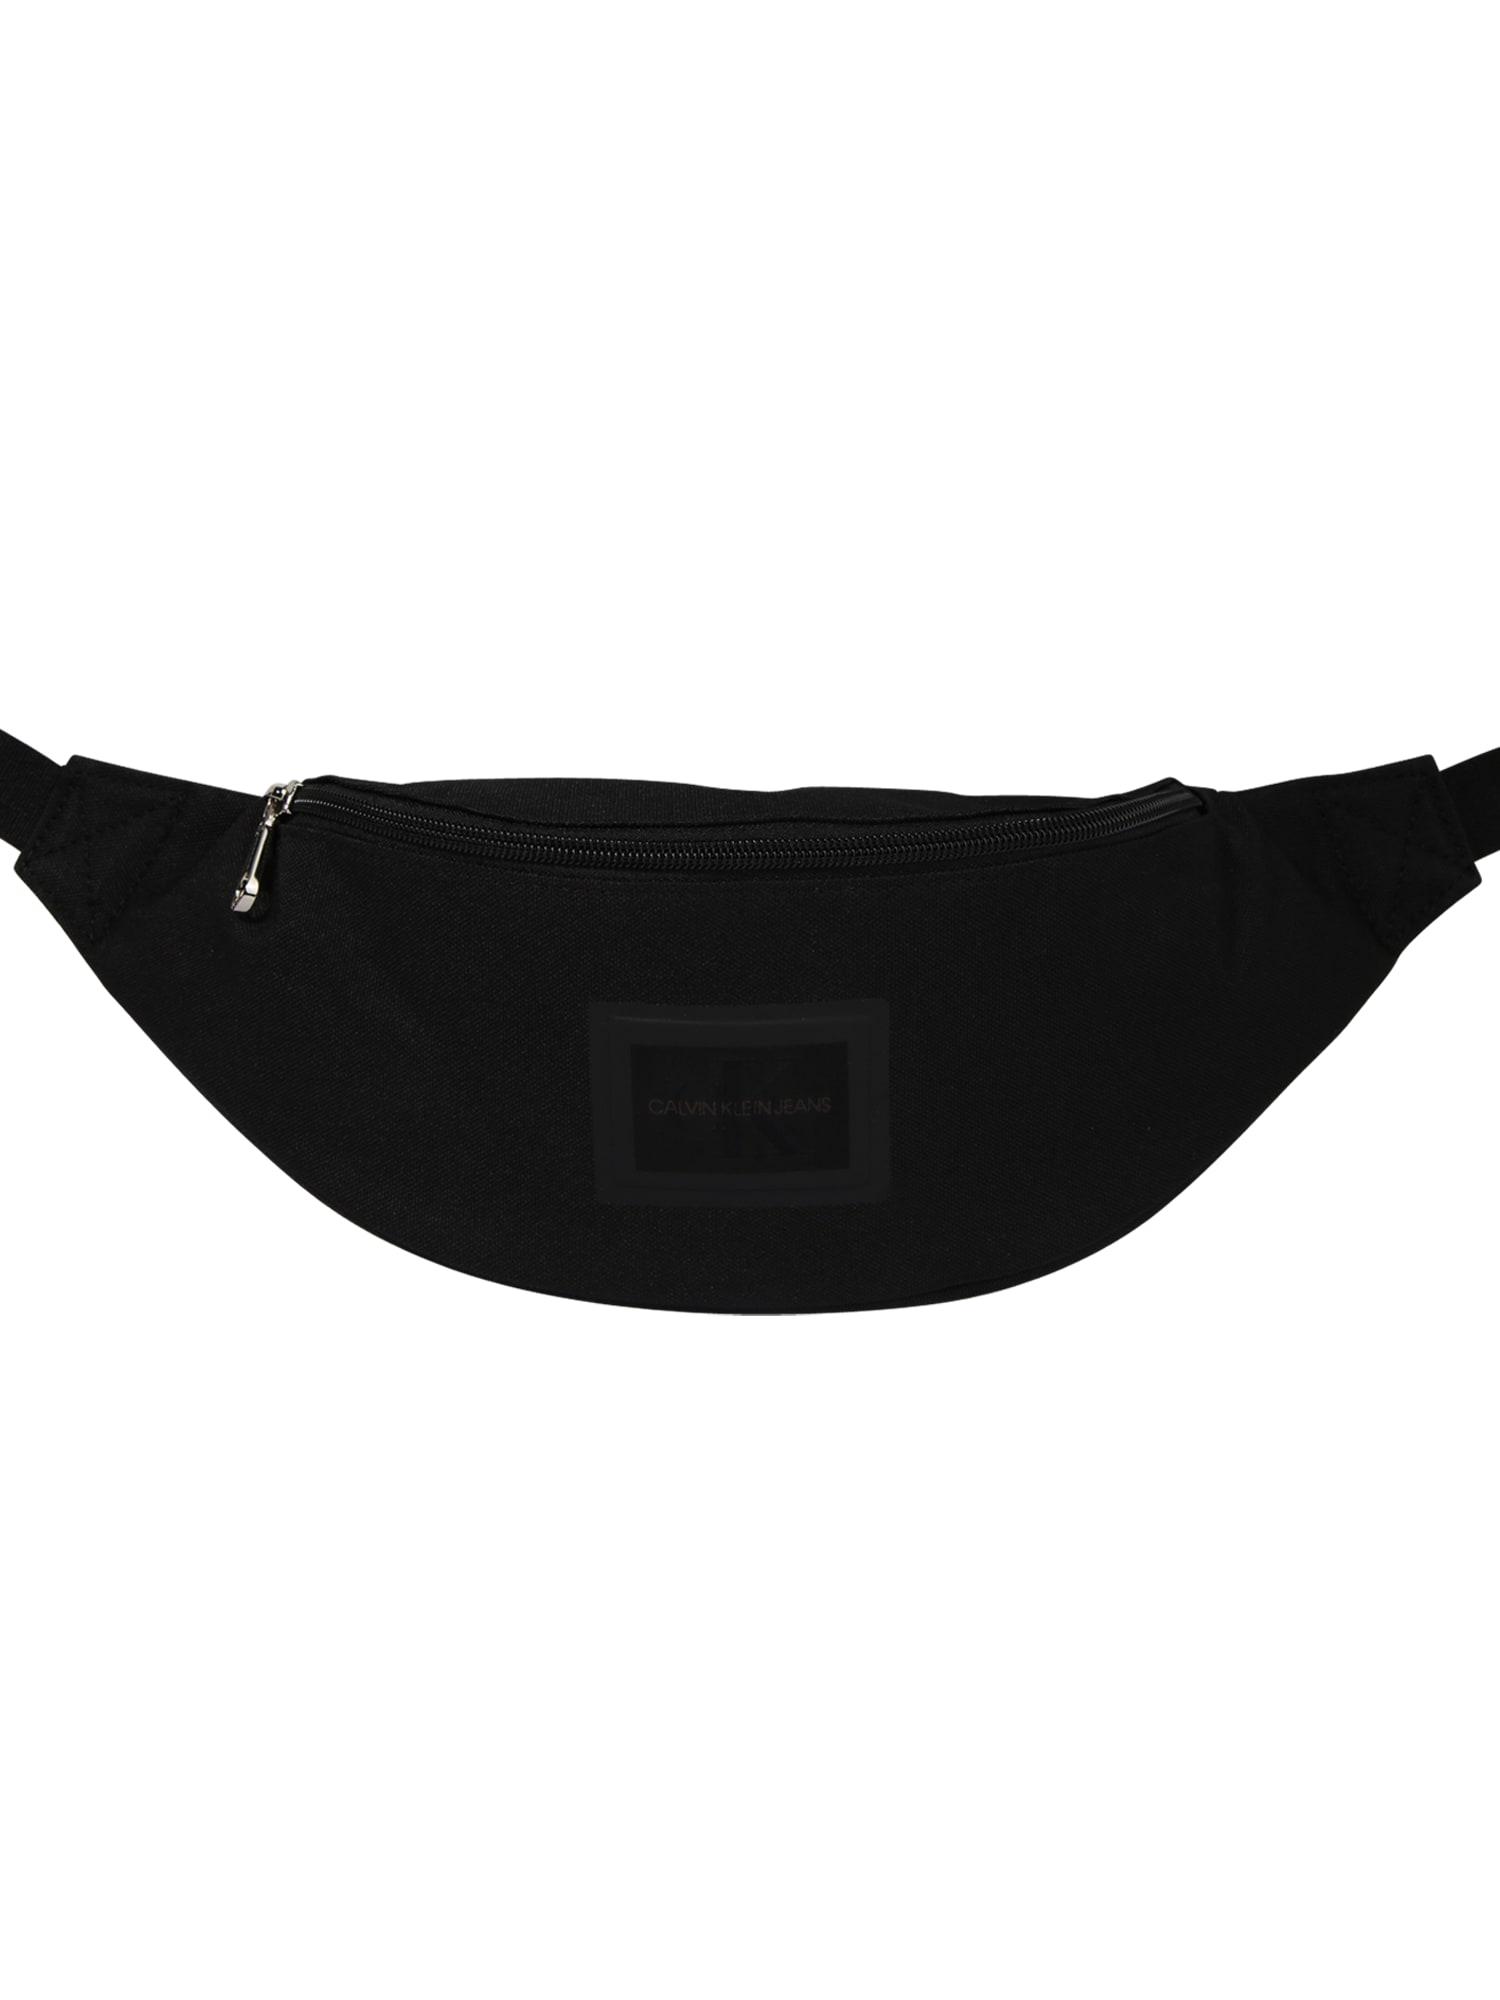 Calvin Klein Jeans Rankinė ant juosmens ' SPORT ESSENTIALS STREETPACK' juoda